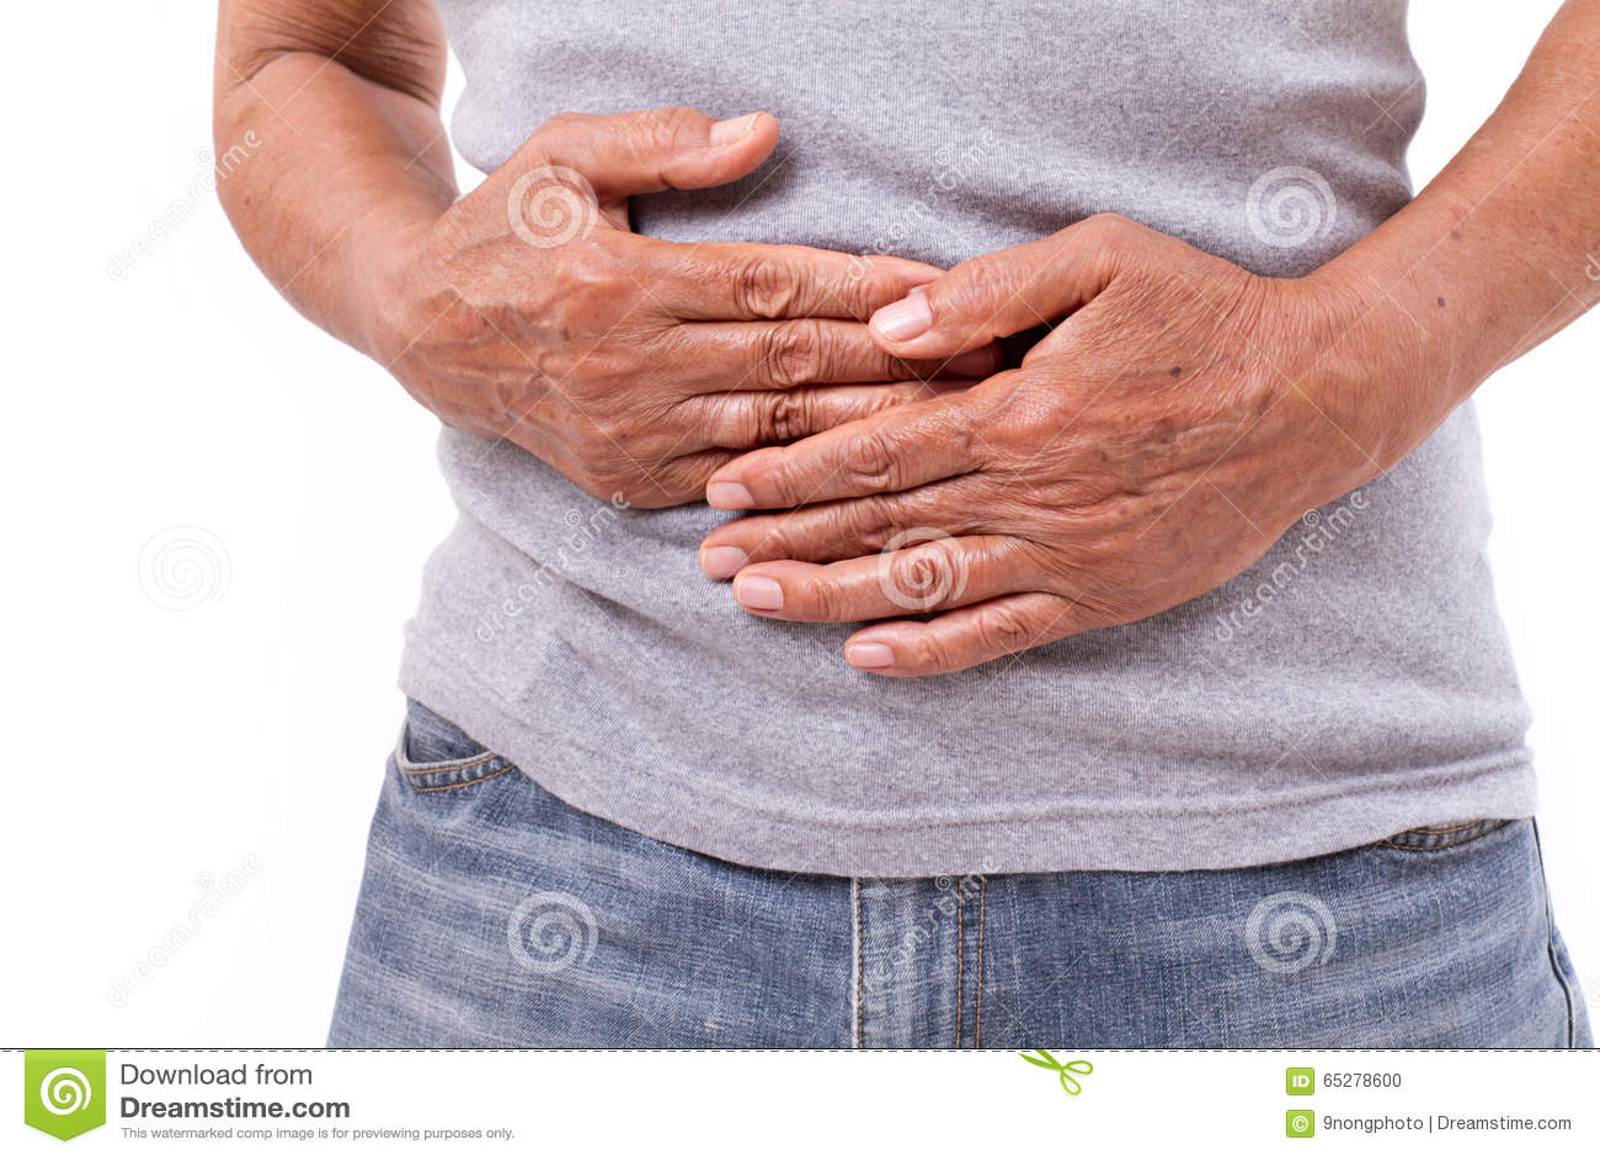 diarrhea pain